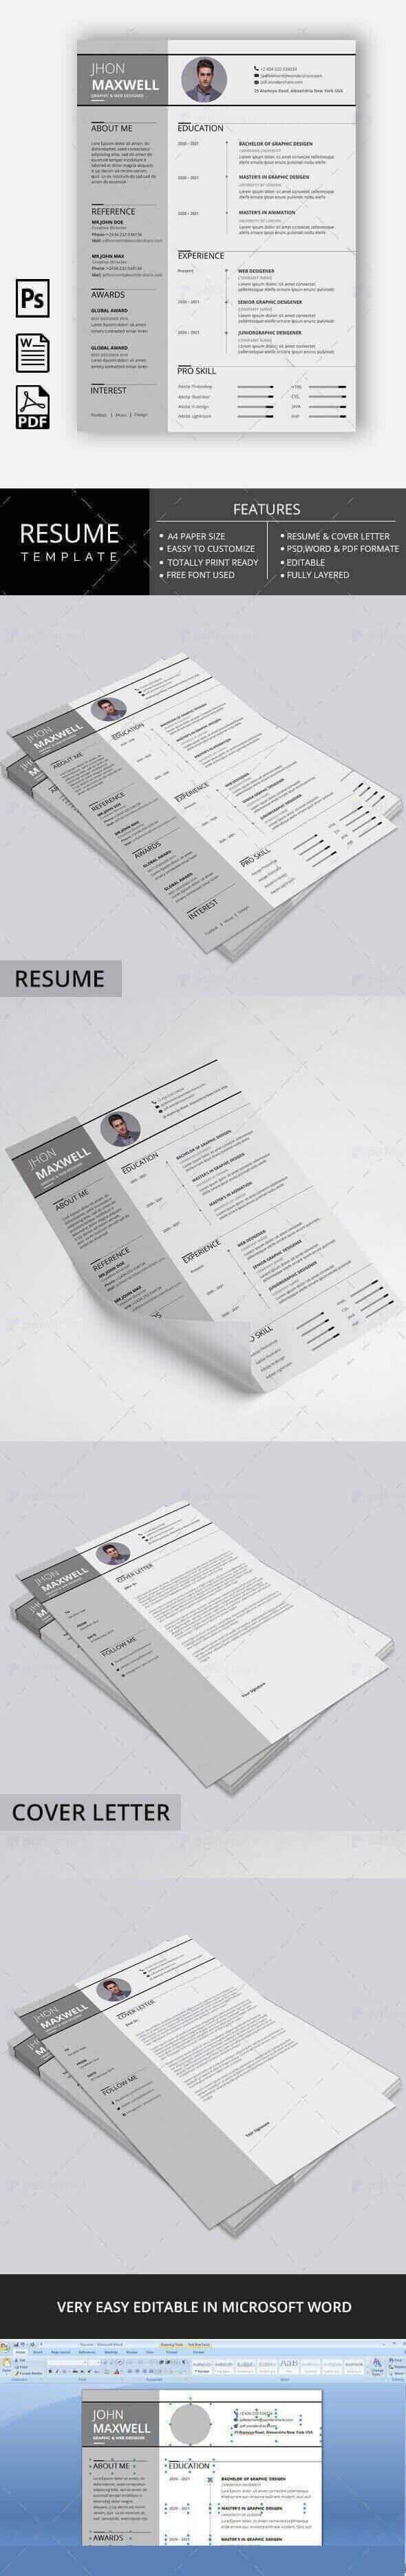 Resume Template - Paradise Gray